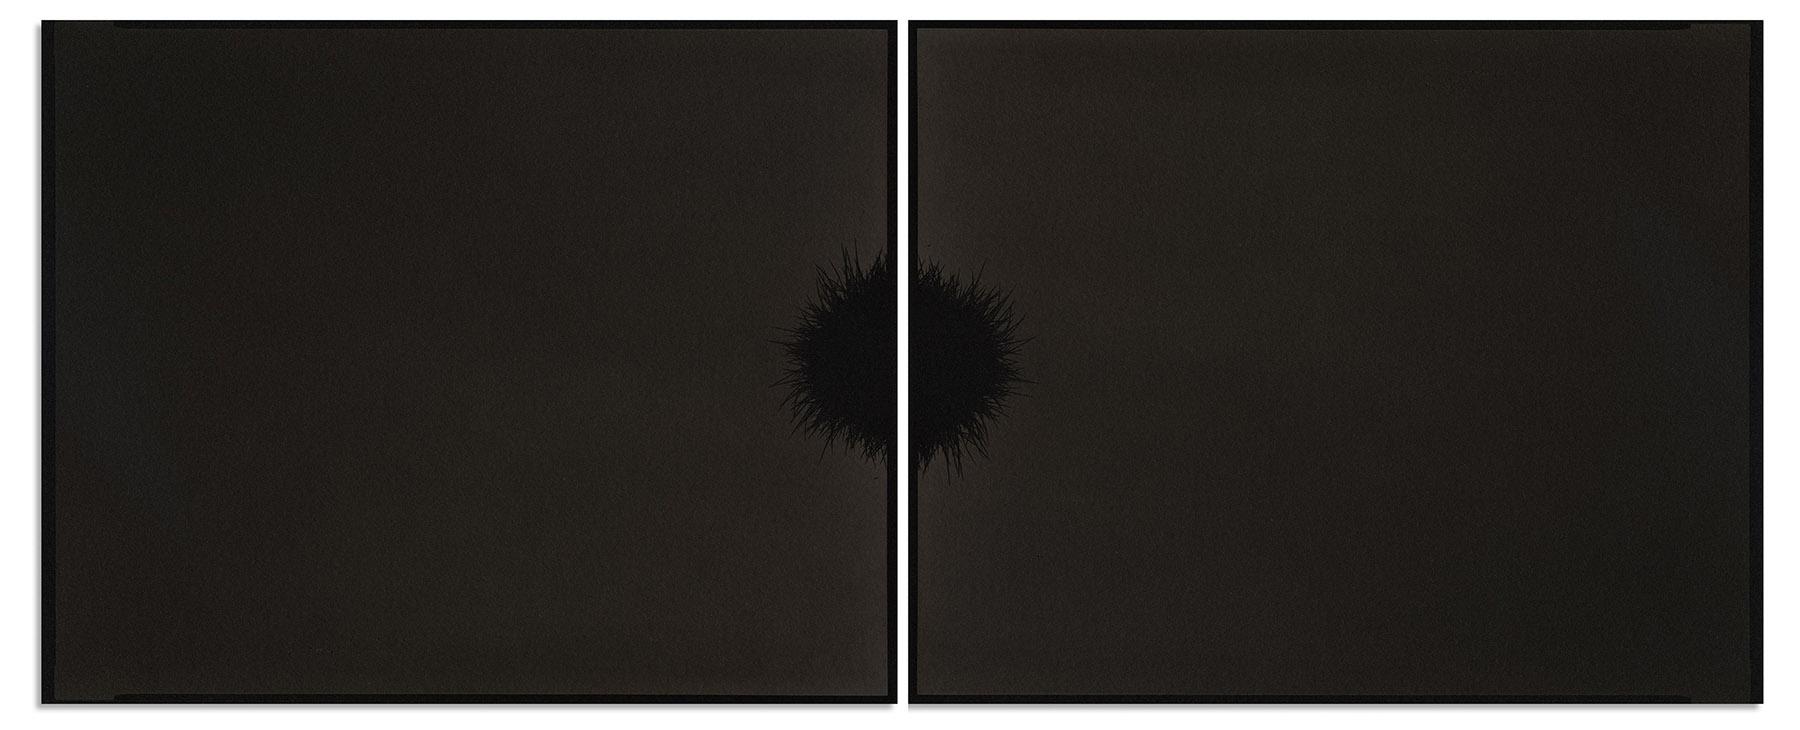 sphere (sonoran desert), 2018